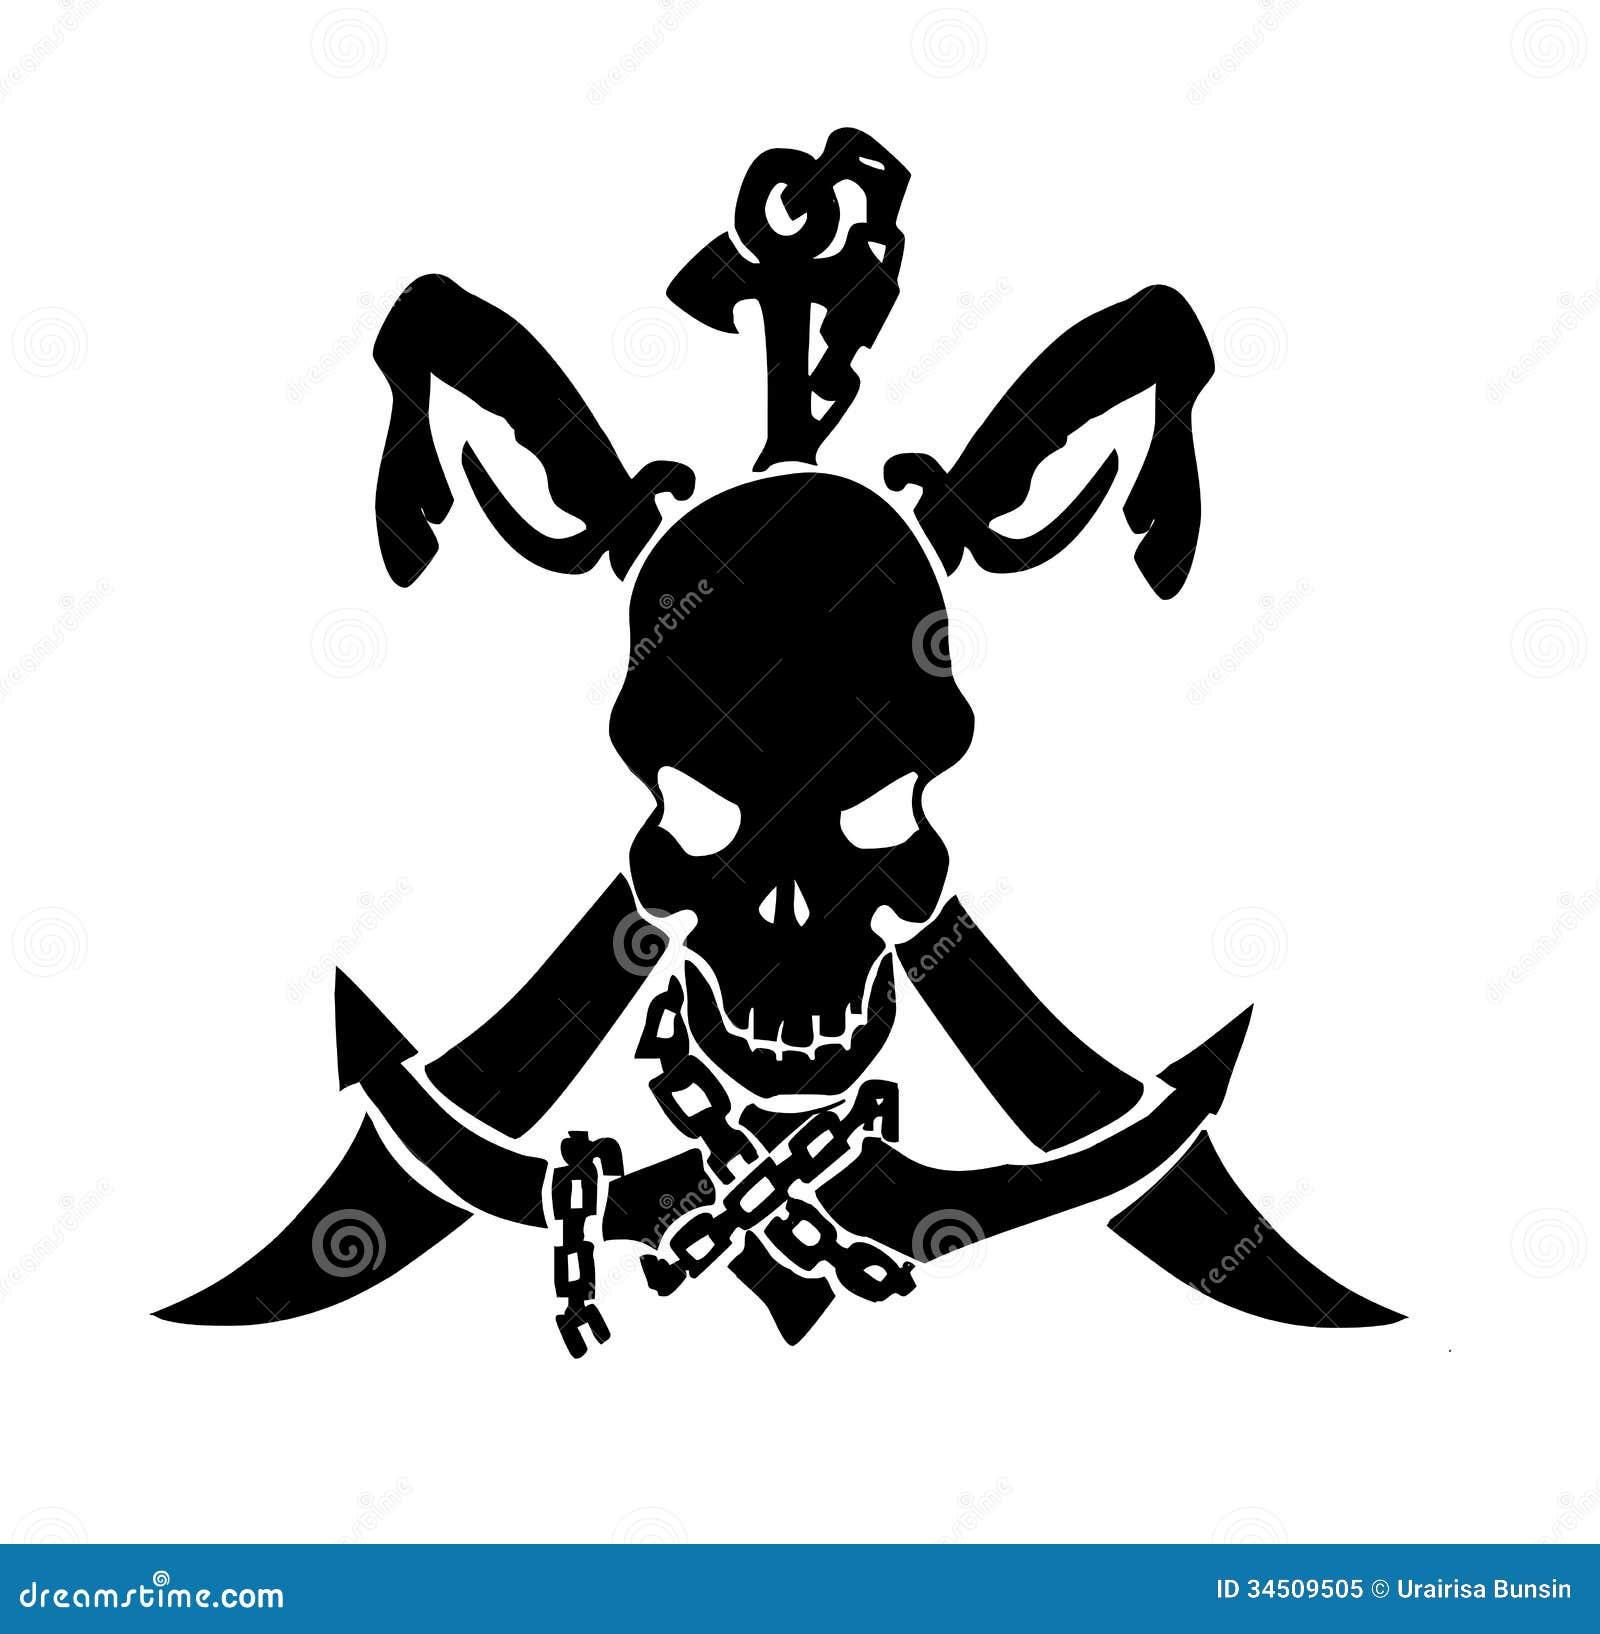 pirate skull tattoo royalty free stock photo image 34509505